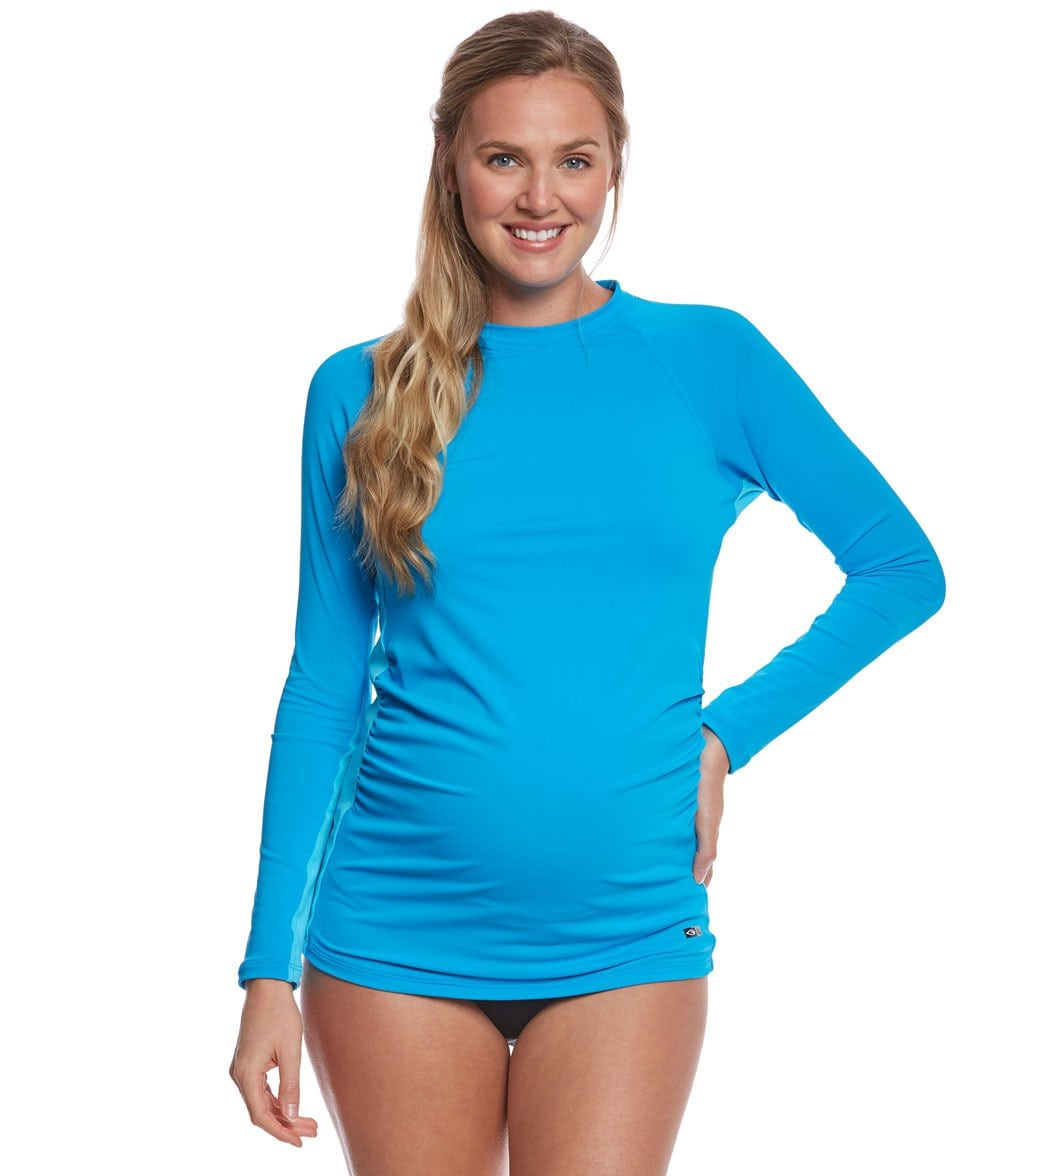 15eb6ea4d2504 EQ Swimwear Turquoise Hawaii Maternity Rashguard at SwimOutlet.com - Free  Shipping